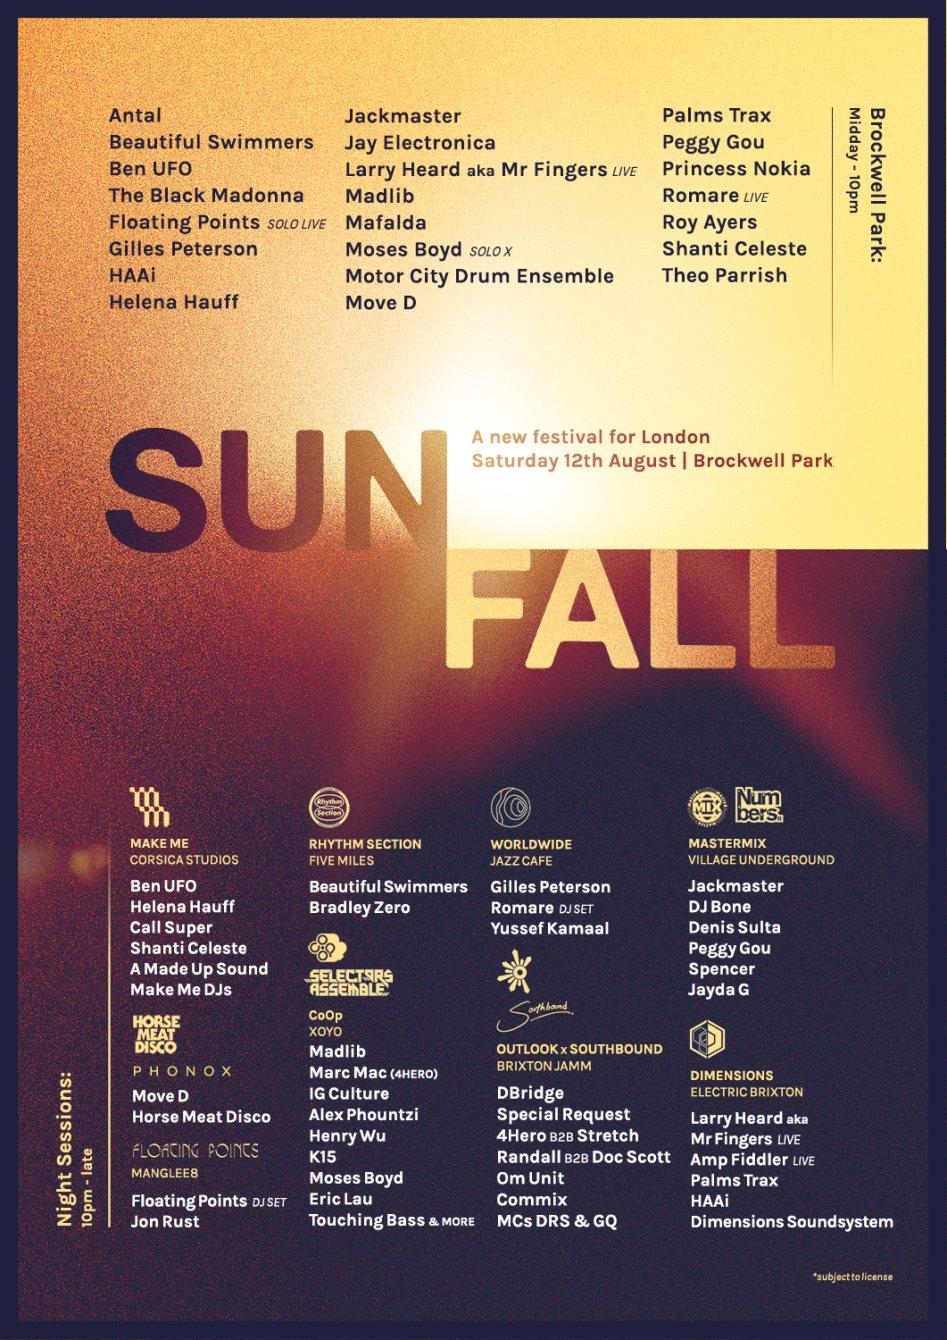 Sunfall Festival 2017 - Flyer front